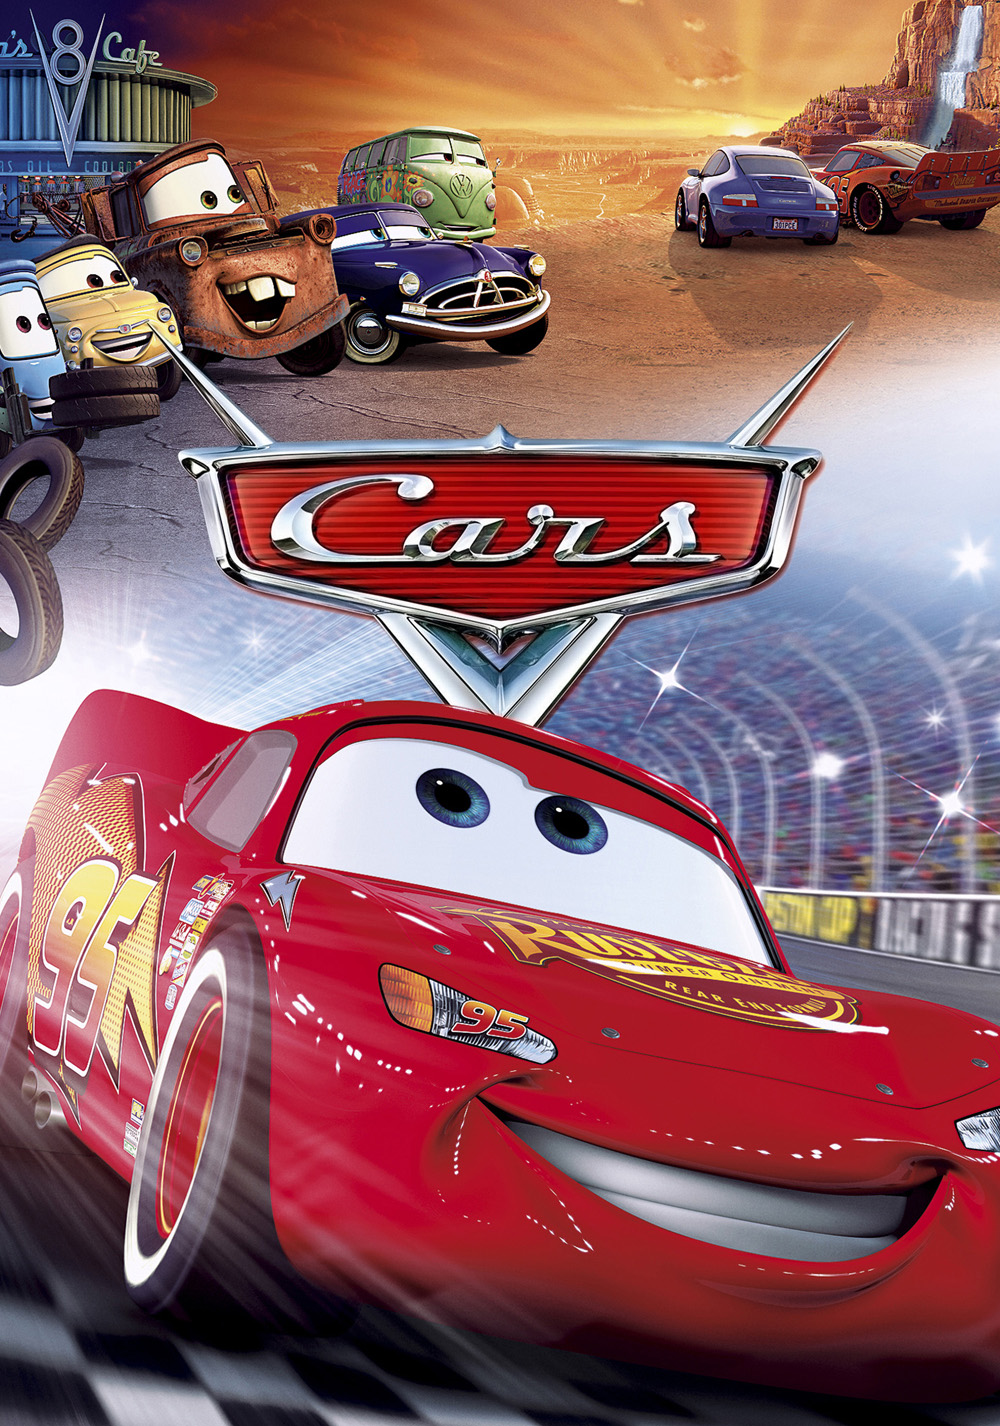 cars tv fanart poster movies film 2006 posters disney pixar dvd carros mcqueen una race films carreras rayo mater walt